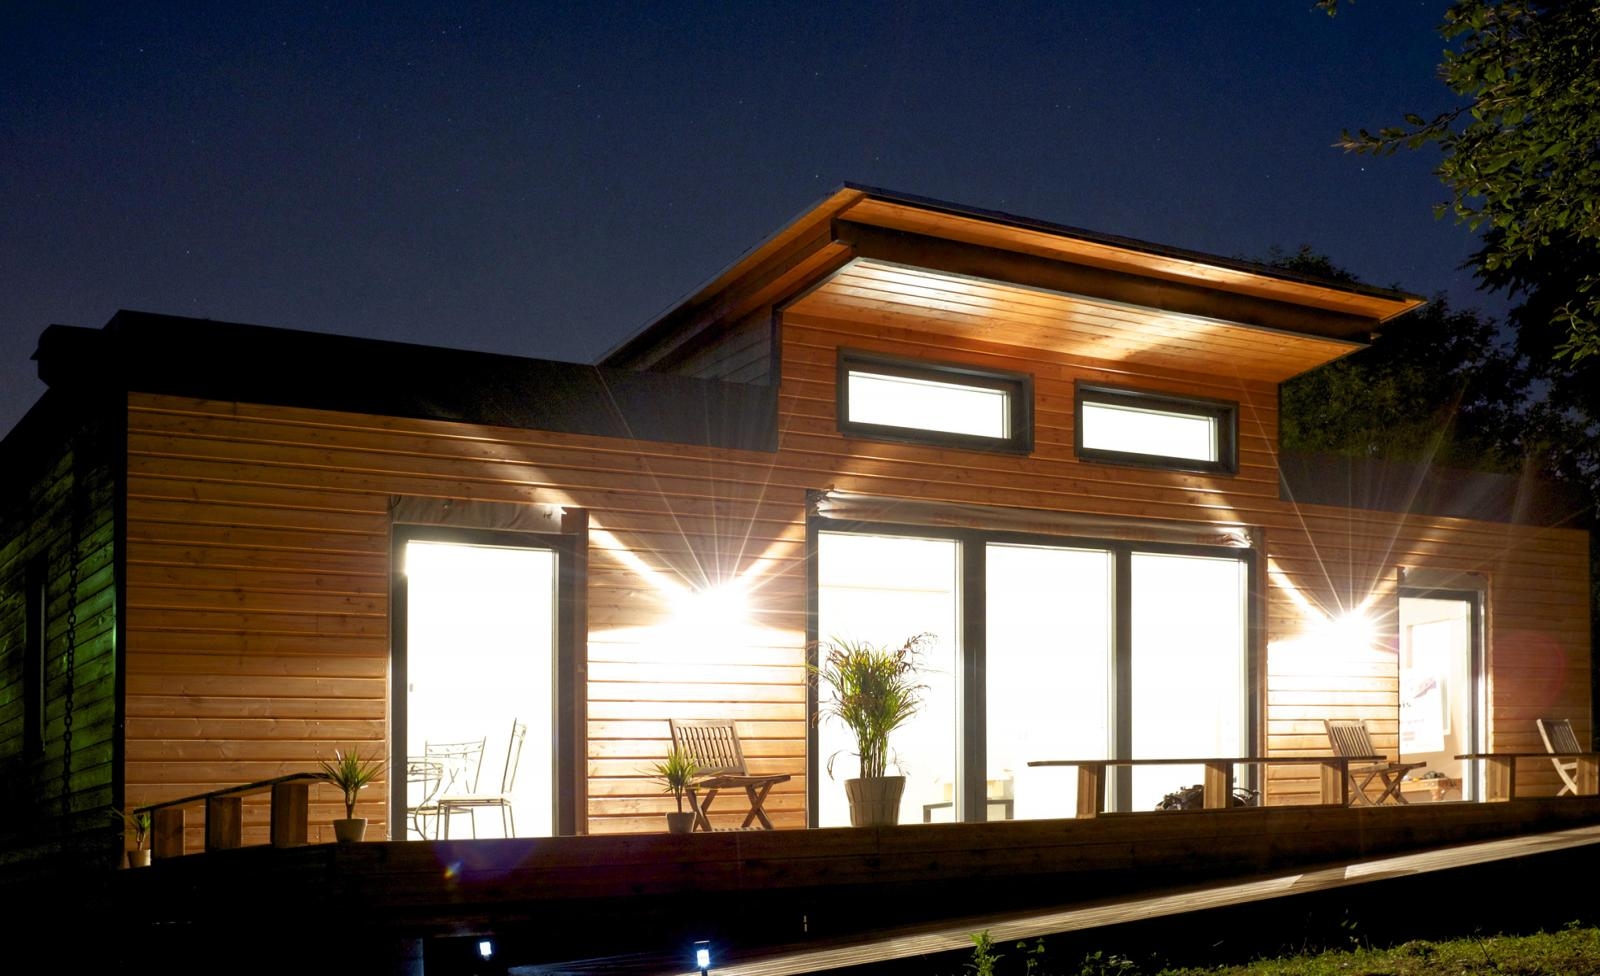 laur at ademe ecoxia peaufine la maison passive pr te poser greenunivers. Black Bedroom Furniture Sets. Home Design Ideas